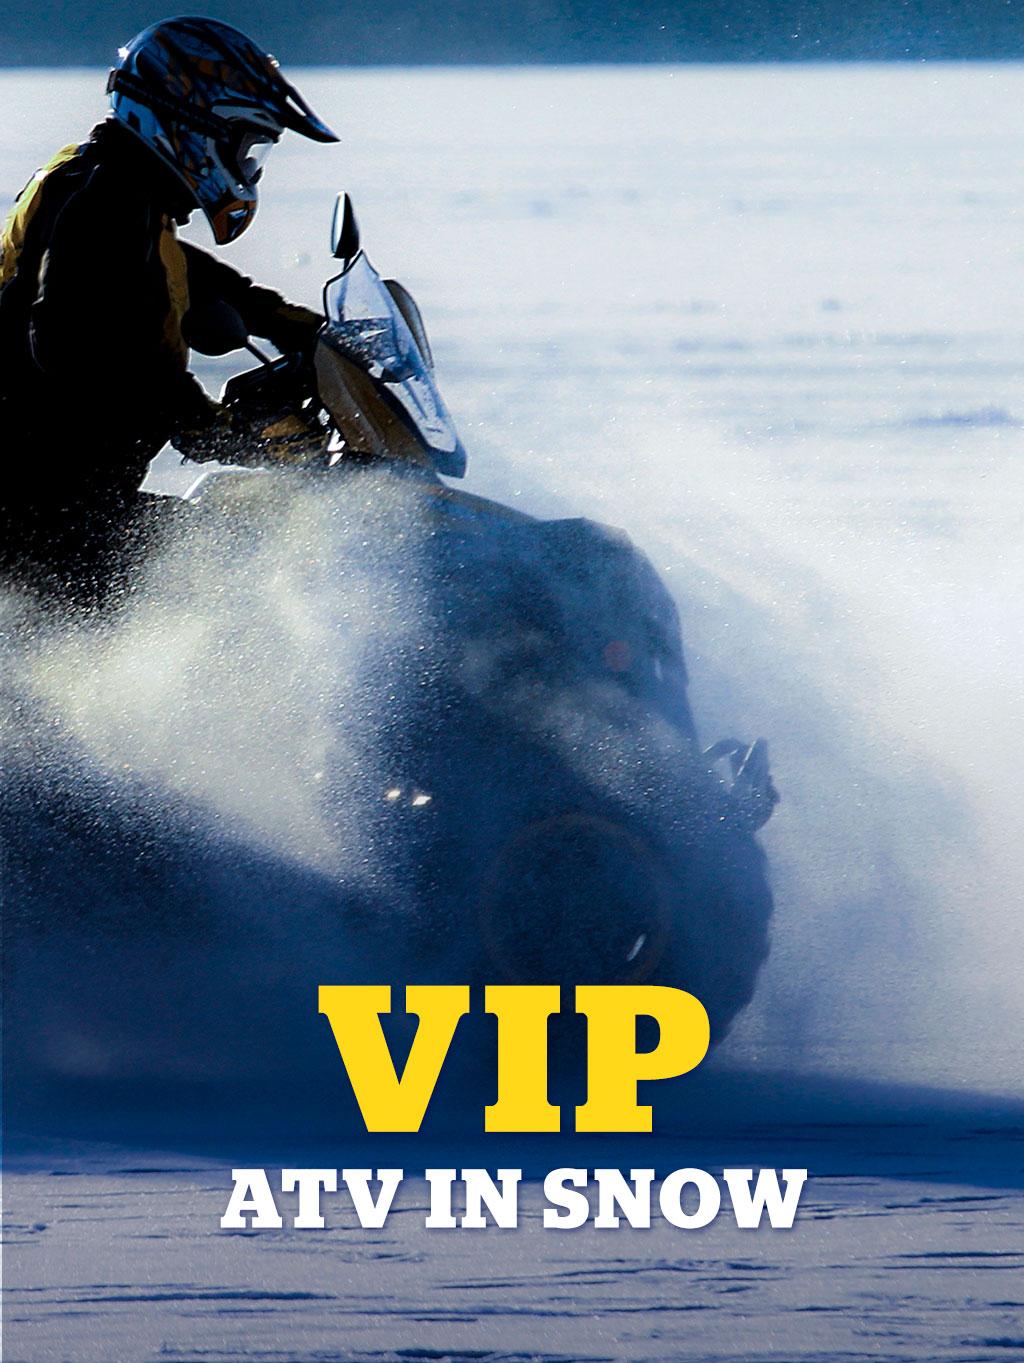 ATV_in_snow_vip_staende